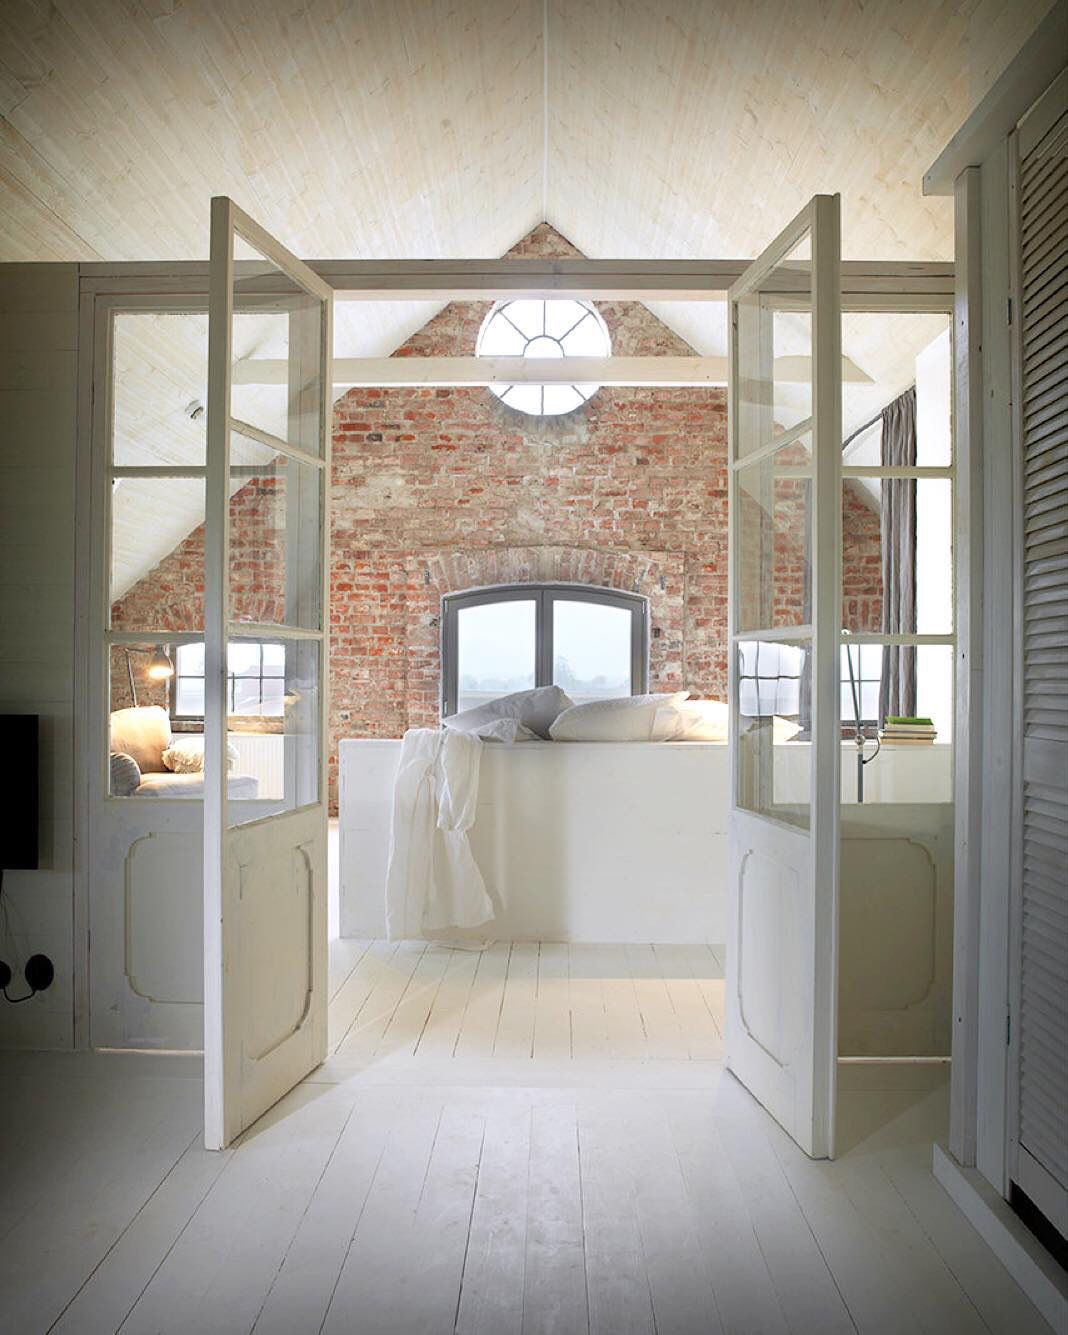 pinshawn harris on home  brick bathroom brick